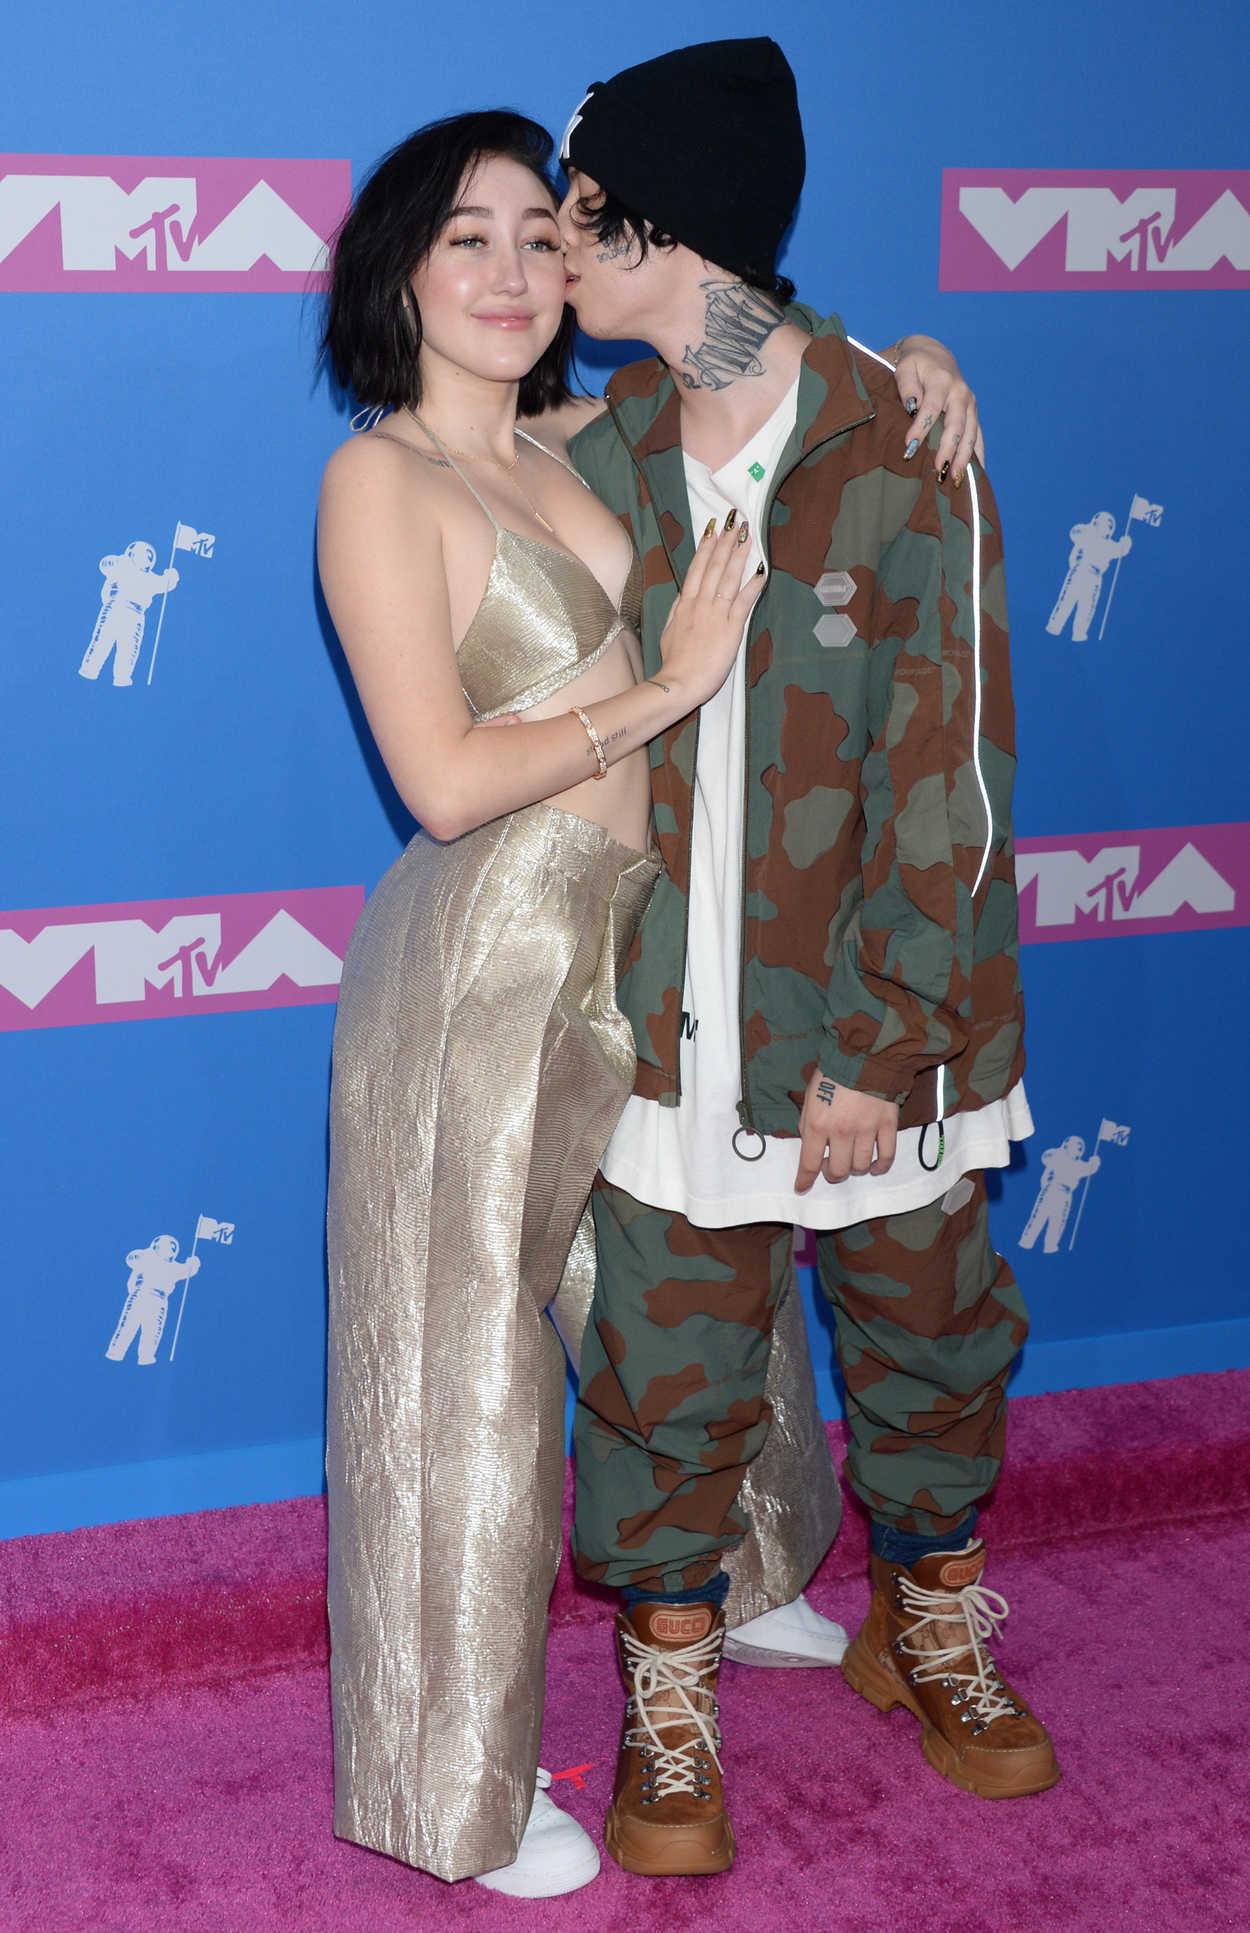 Noah Cyrus Attends 2018 Mtv Video Music Awards In New York 08 20 2018 Celebsla Com